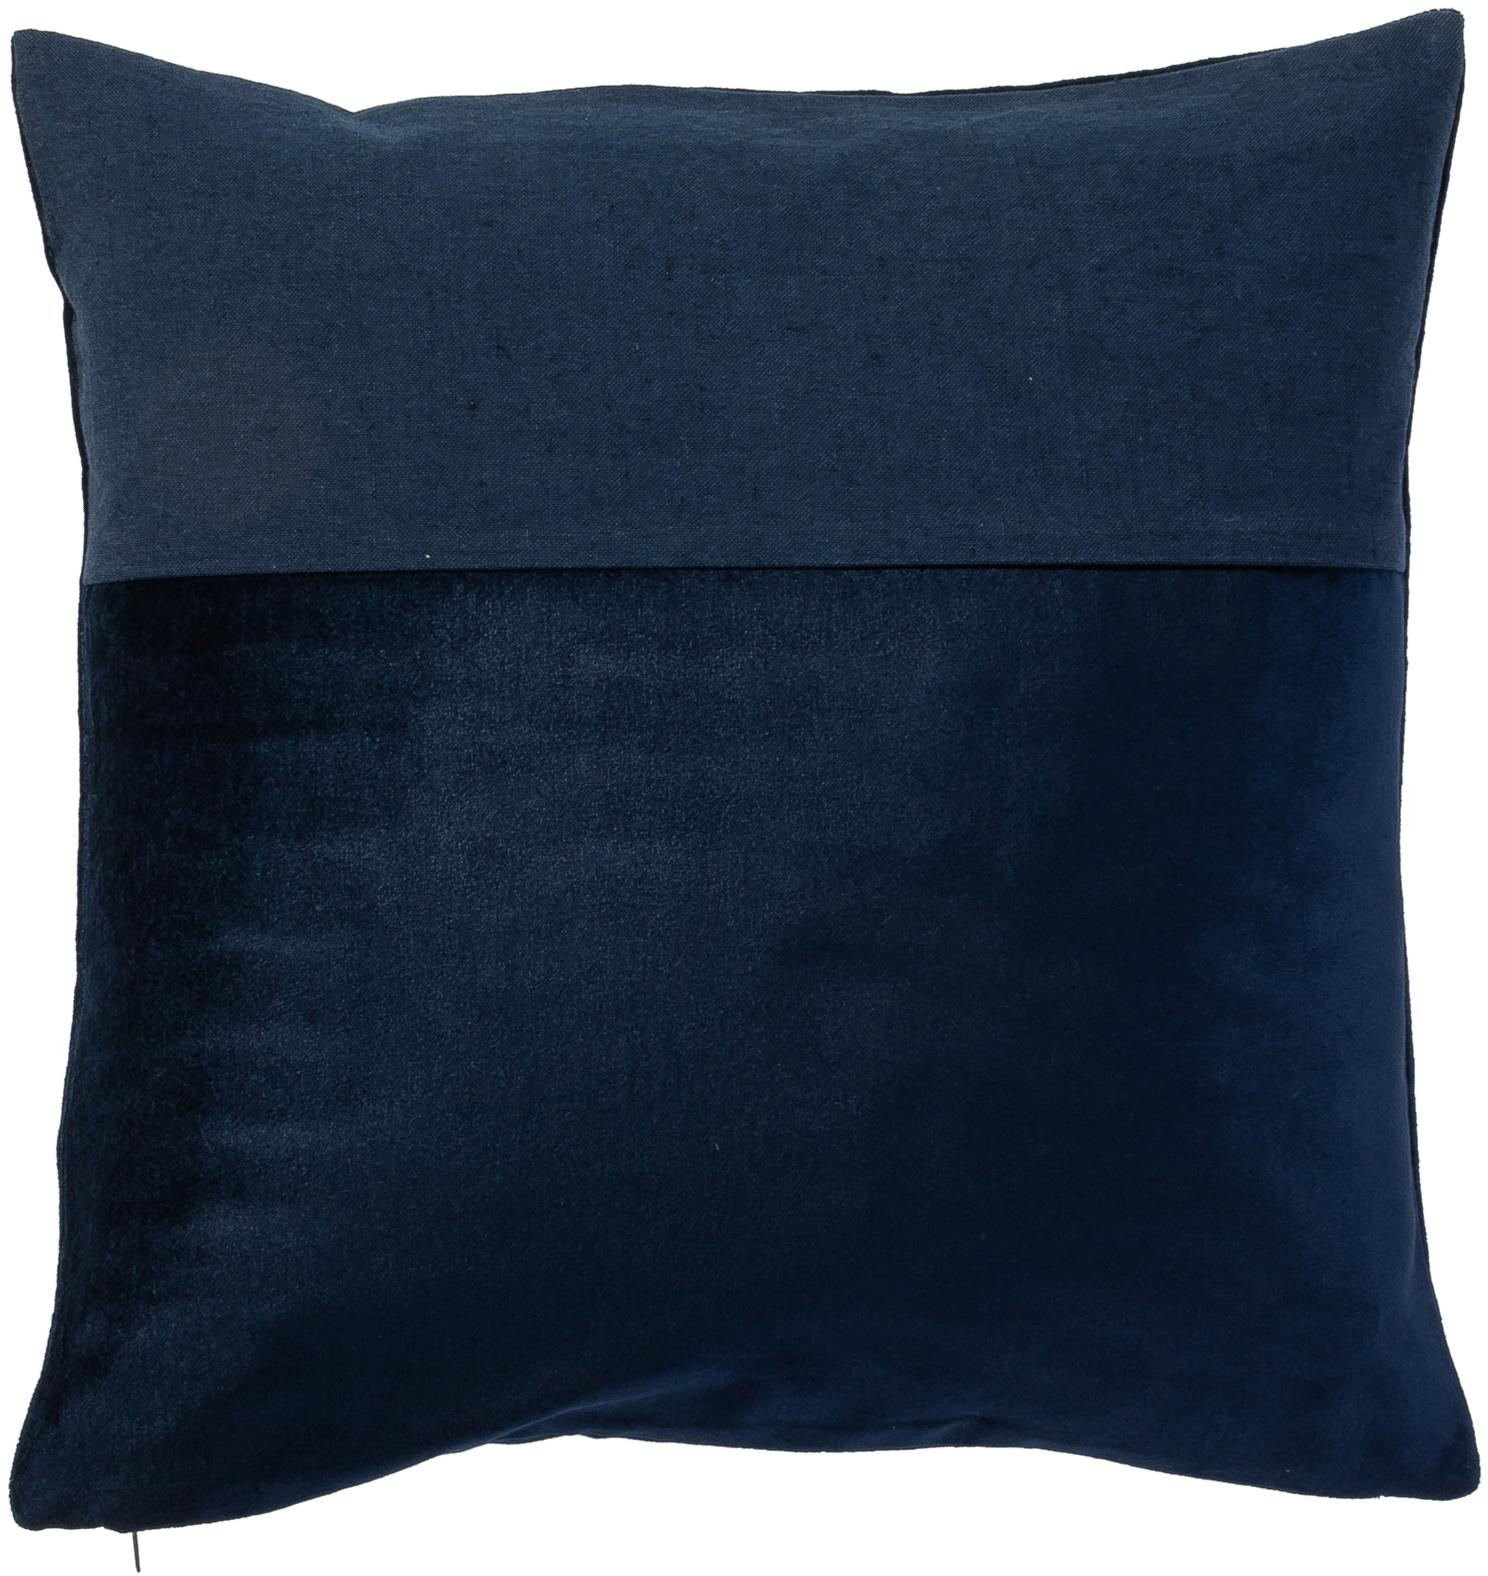 Federa arredo in velluto Adelaide, Blu scuro, Larg. 40 x Lung. 40 cm